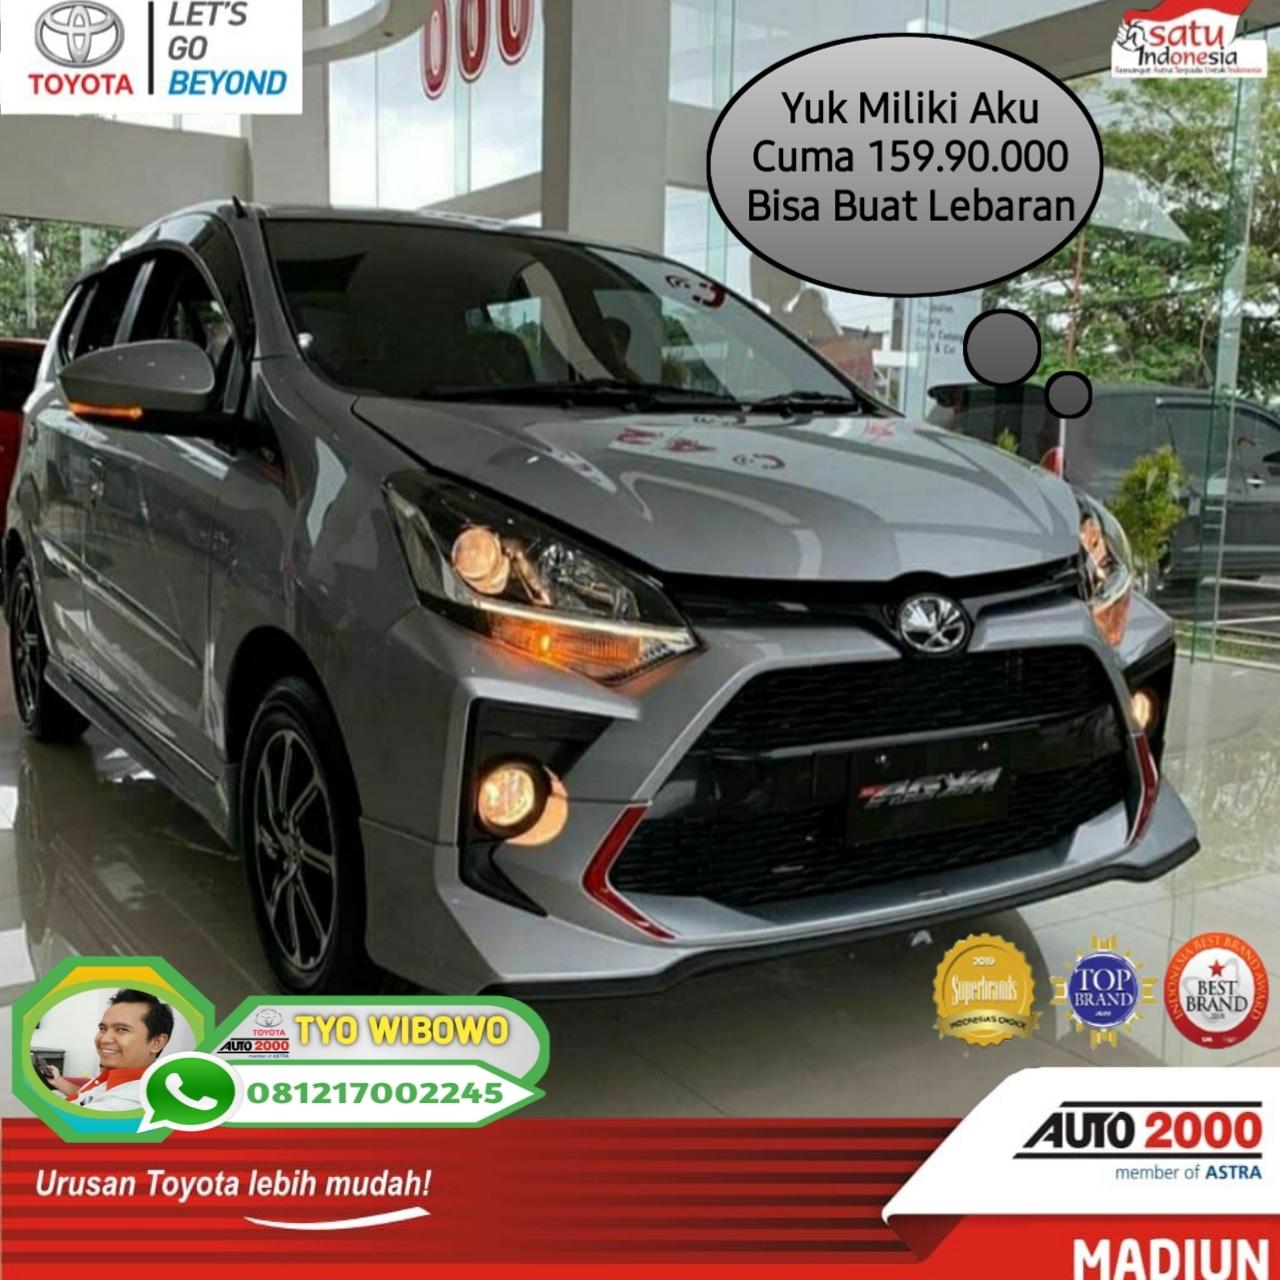 Promo New Agya 2020 Buat Lebaran .Hub : Tyo Wibowo 081217002245 Auto2000 Madiun